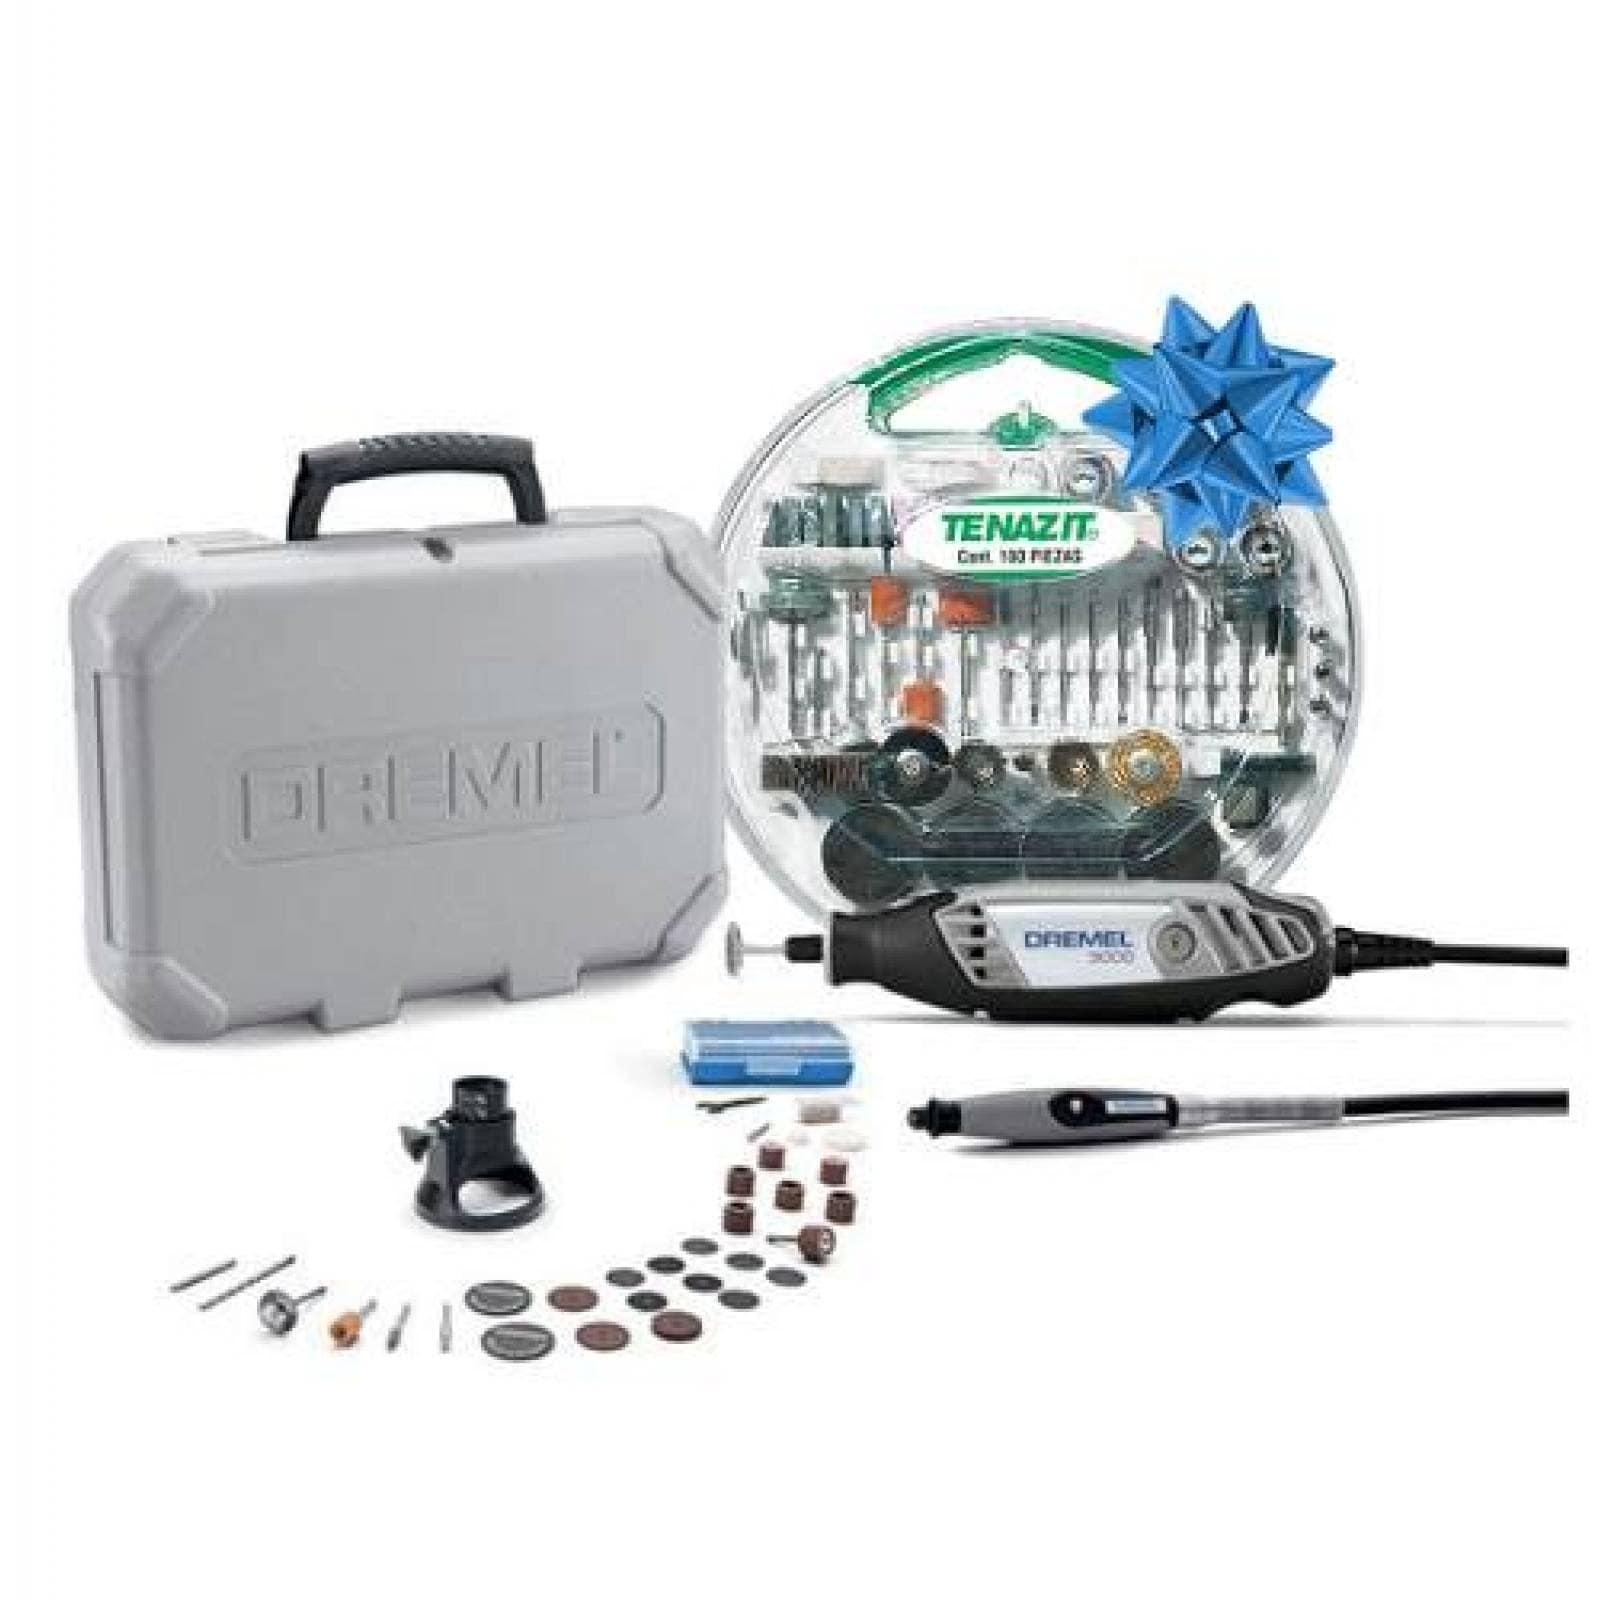 Kit Mototool Dremel 3000 + Kit B&d Accesorios 180 pz Dremel